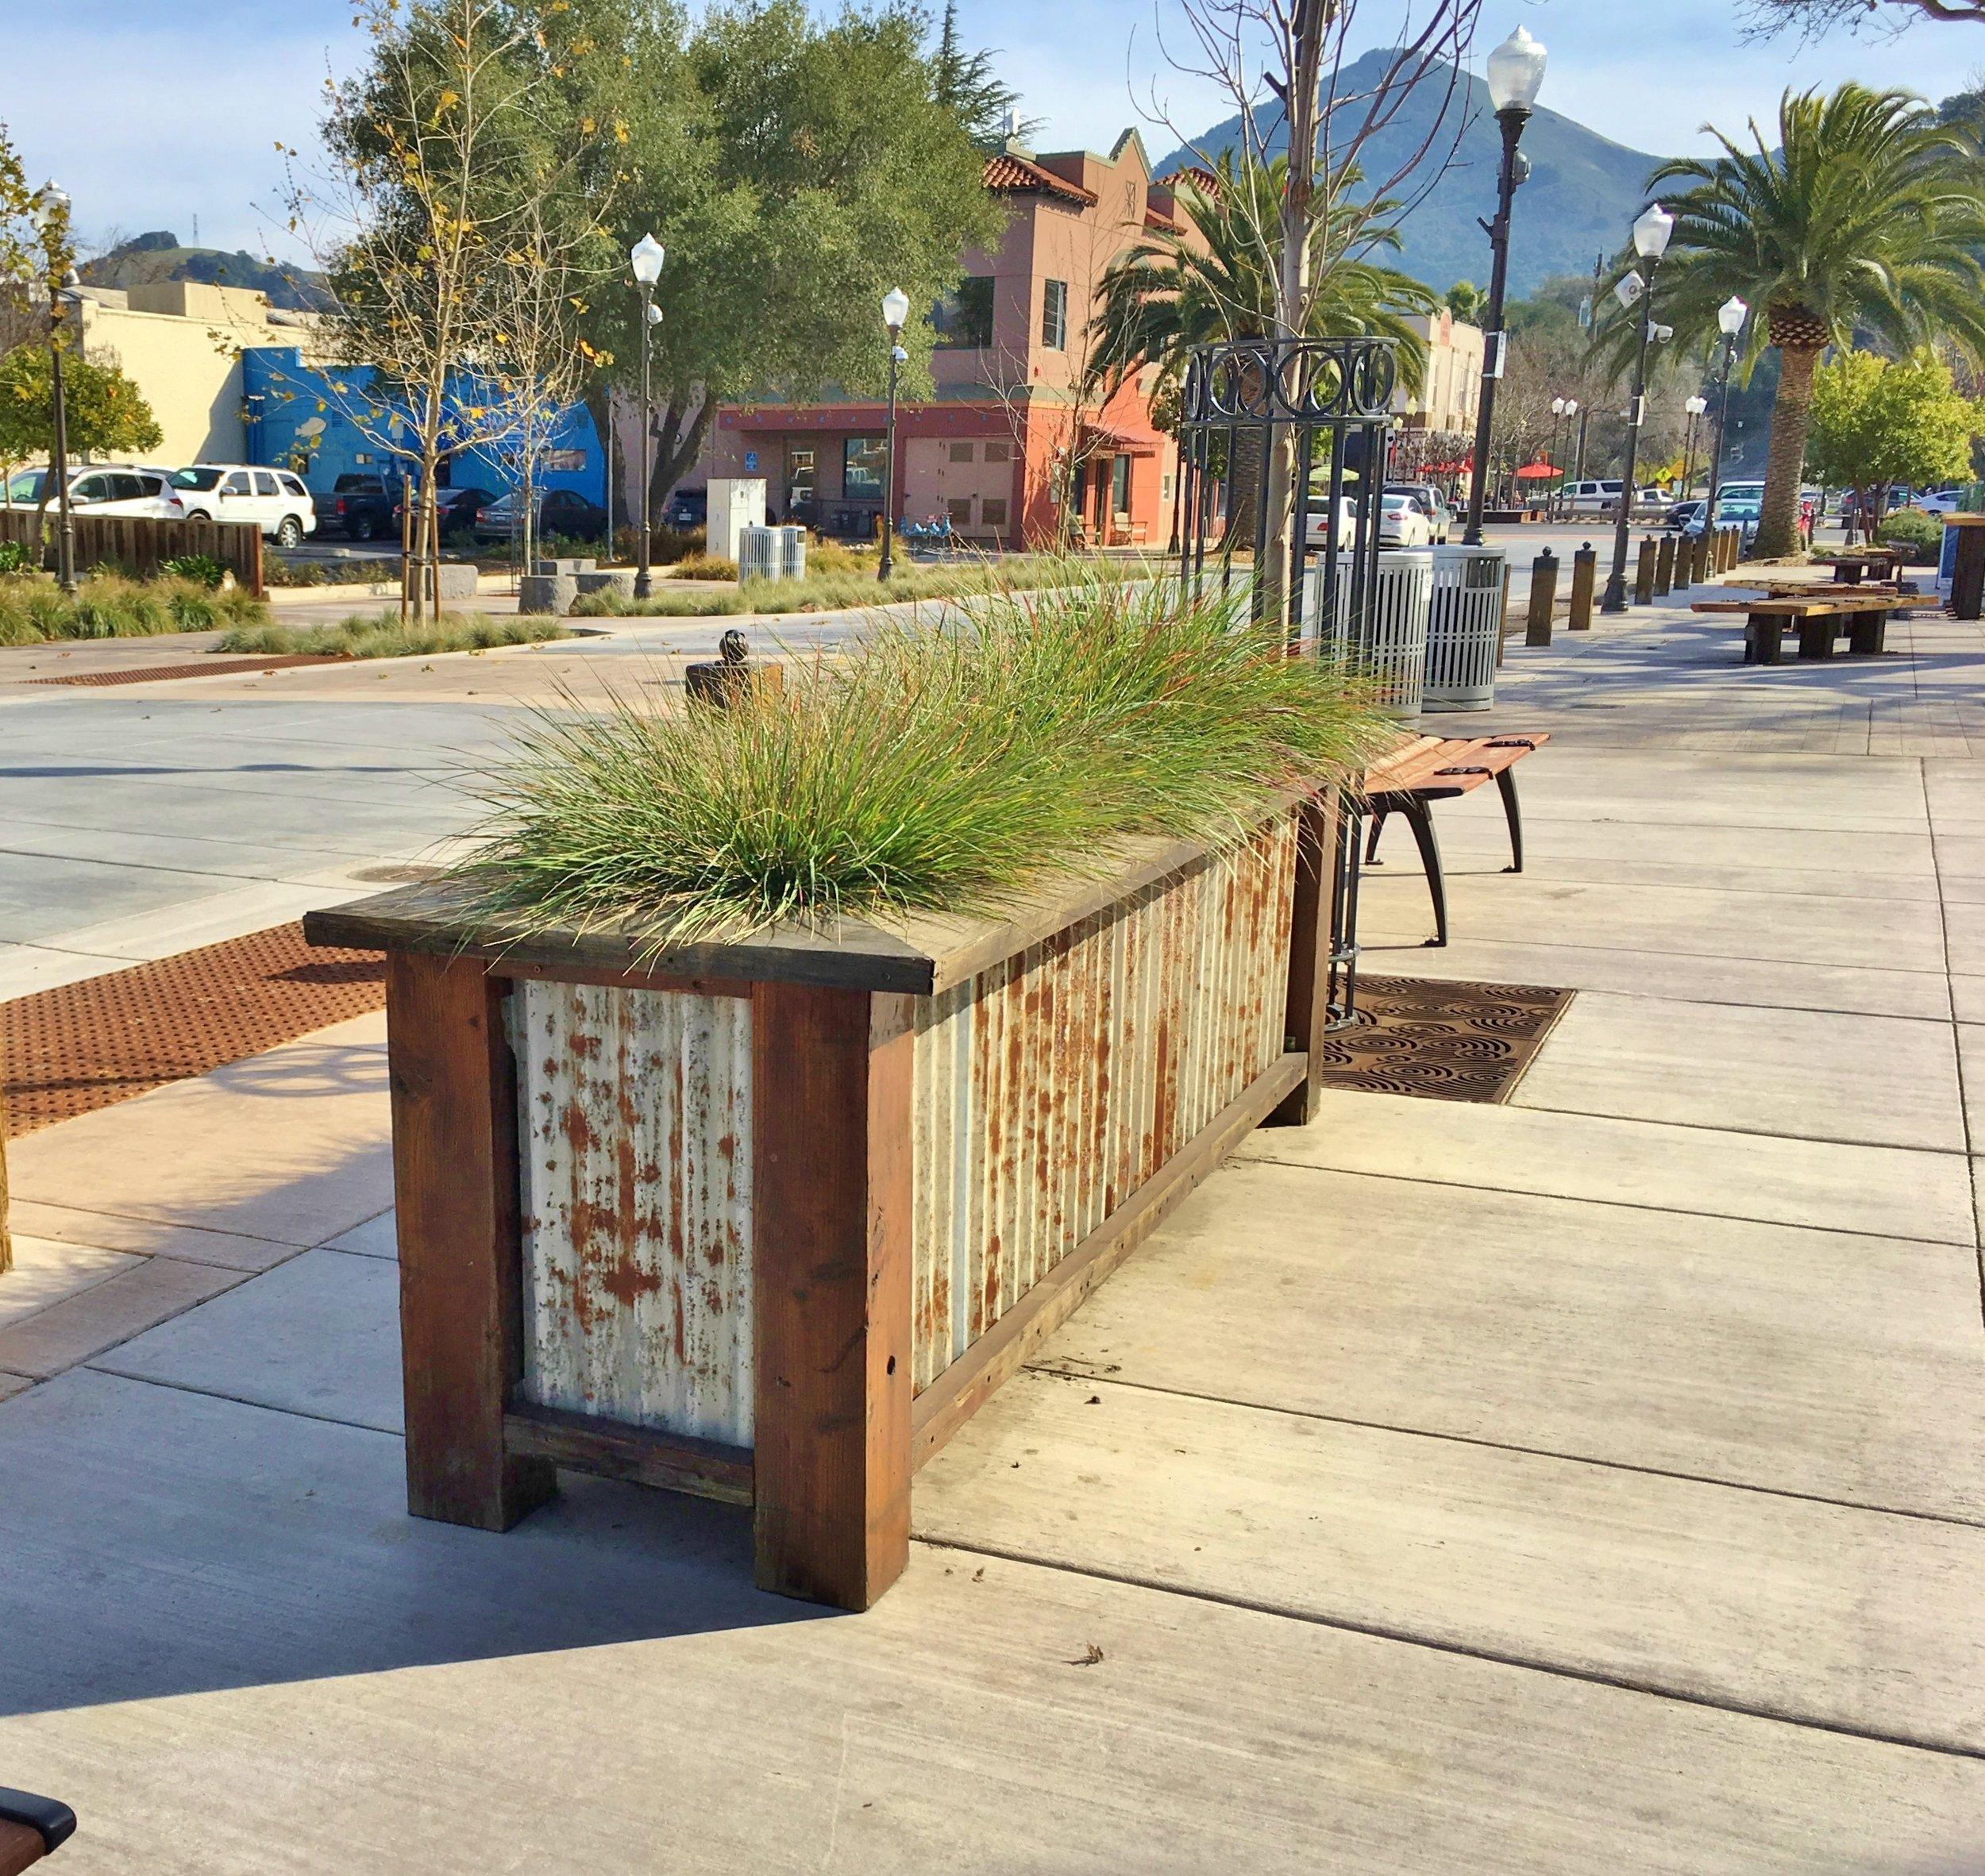 Raised Planter build of site salvaged materials